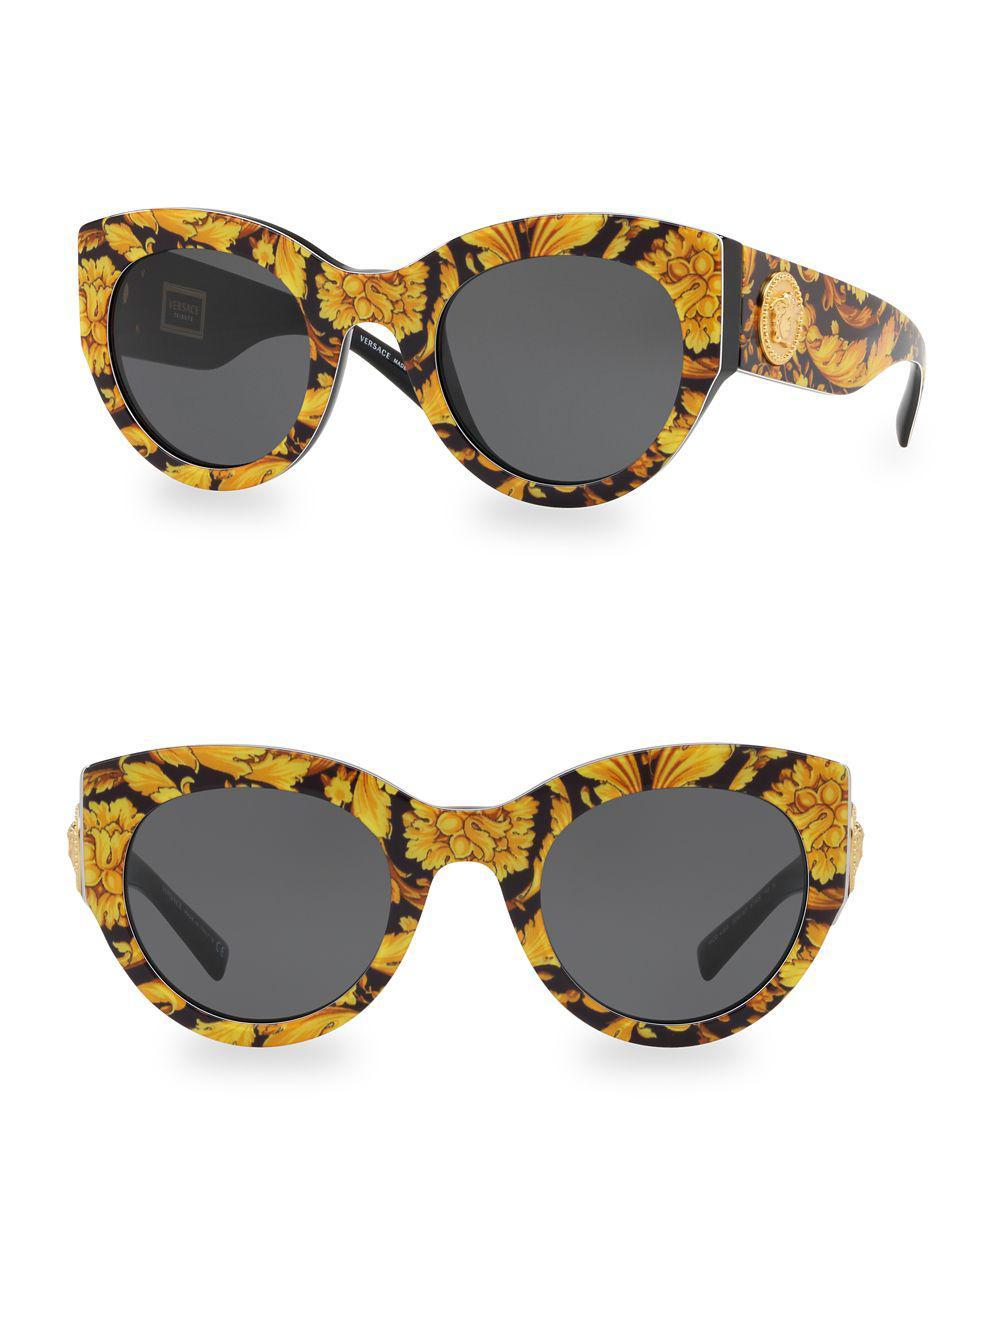 9e7565af629d Versace 51mm Cat Eye Sunglasses in Black - Lyst